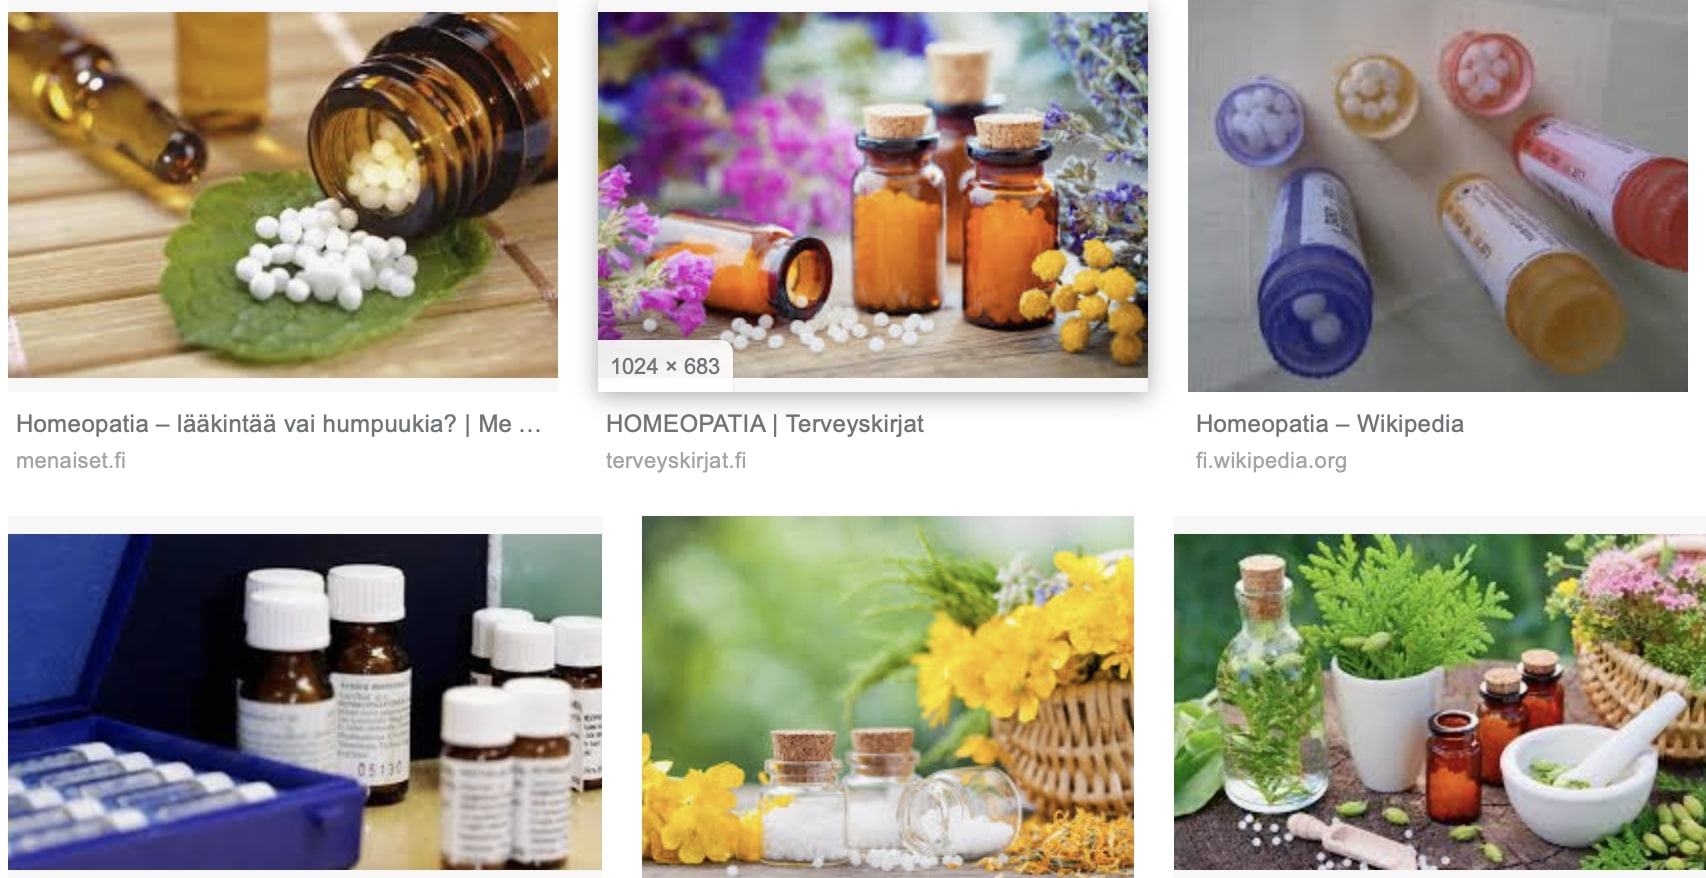 moxaus, ayurveda, akupunktio, luontaishoito, puoskarilaki, homeopatia